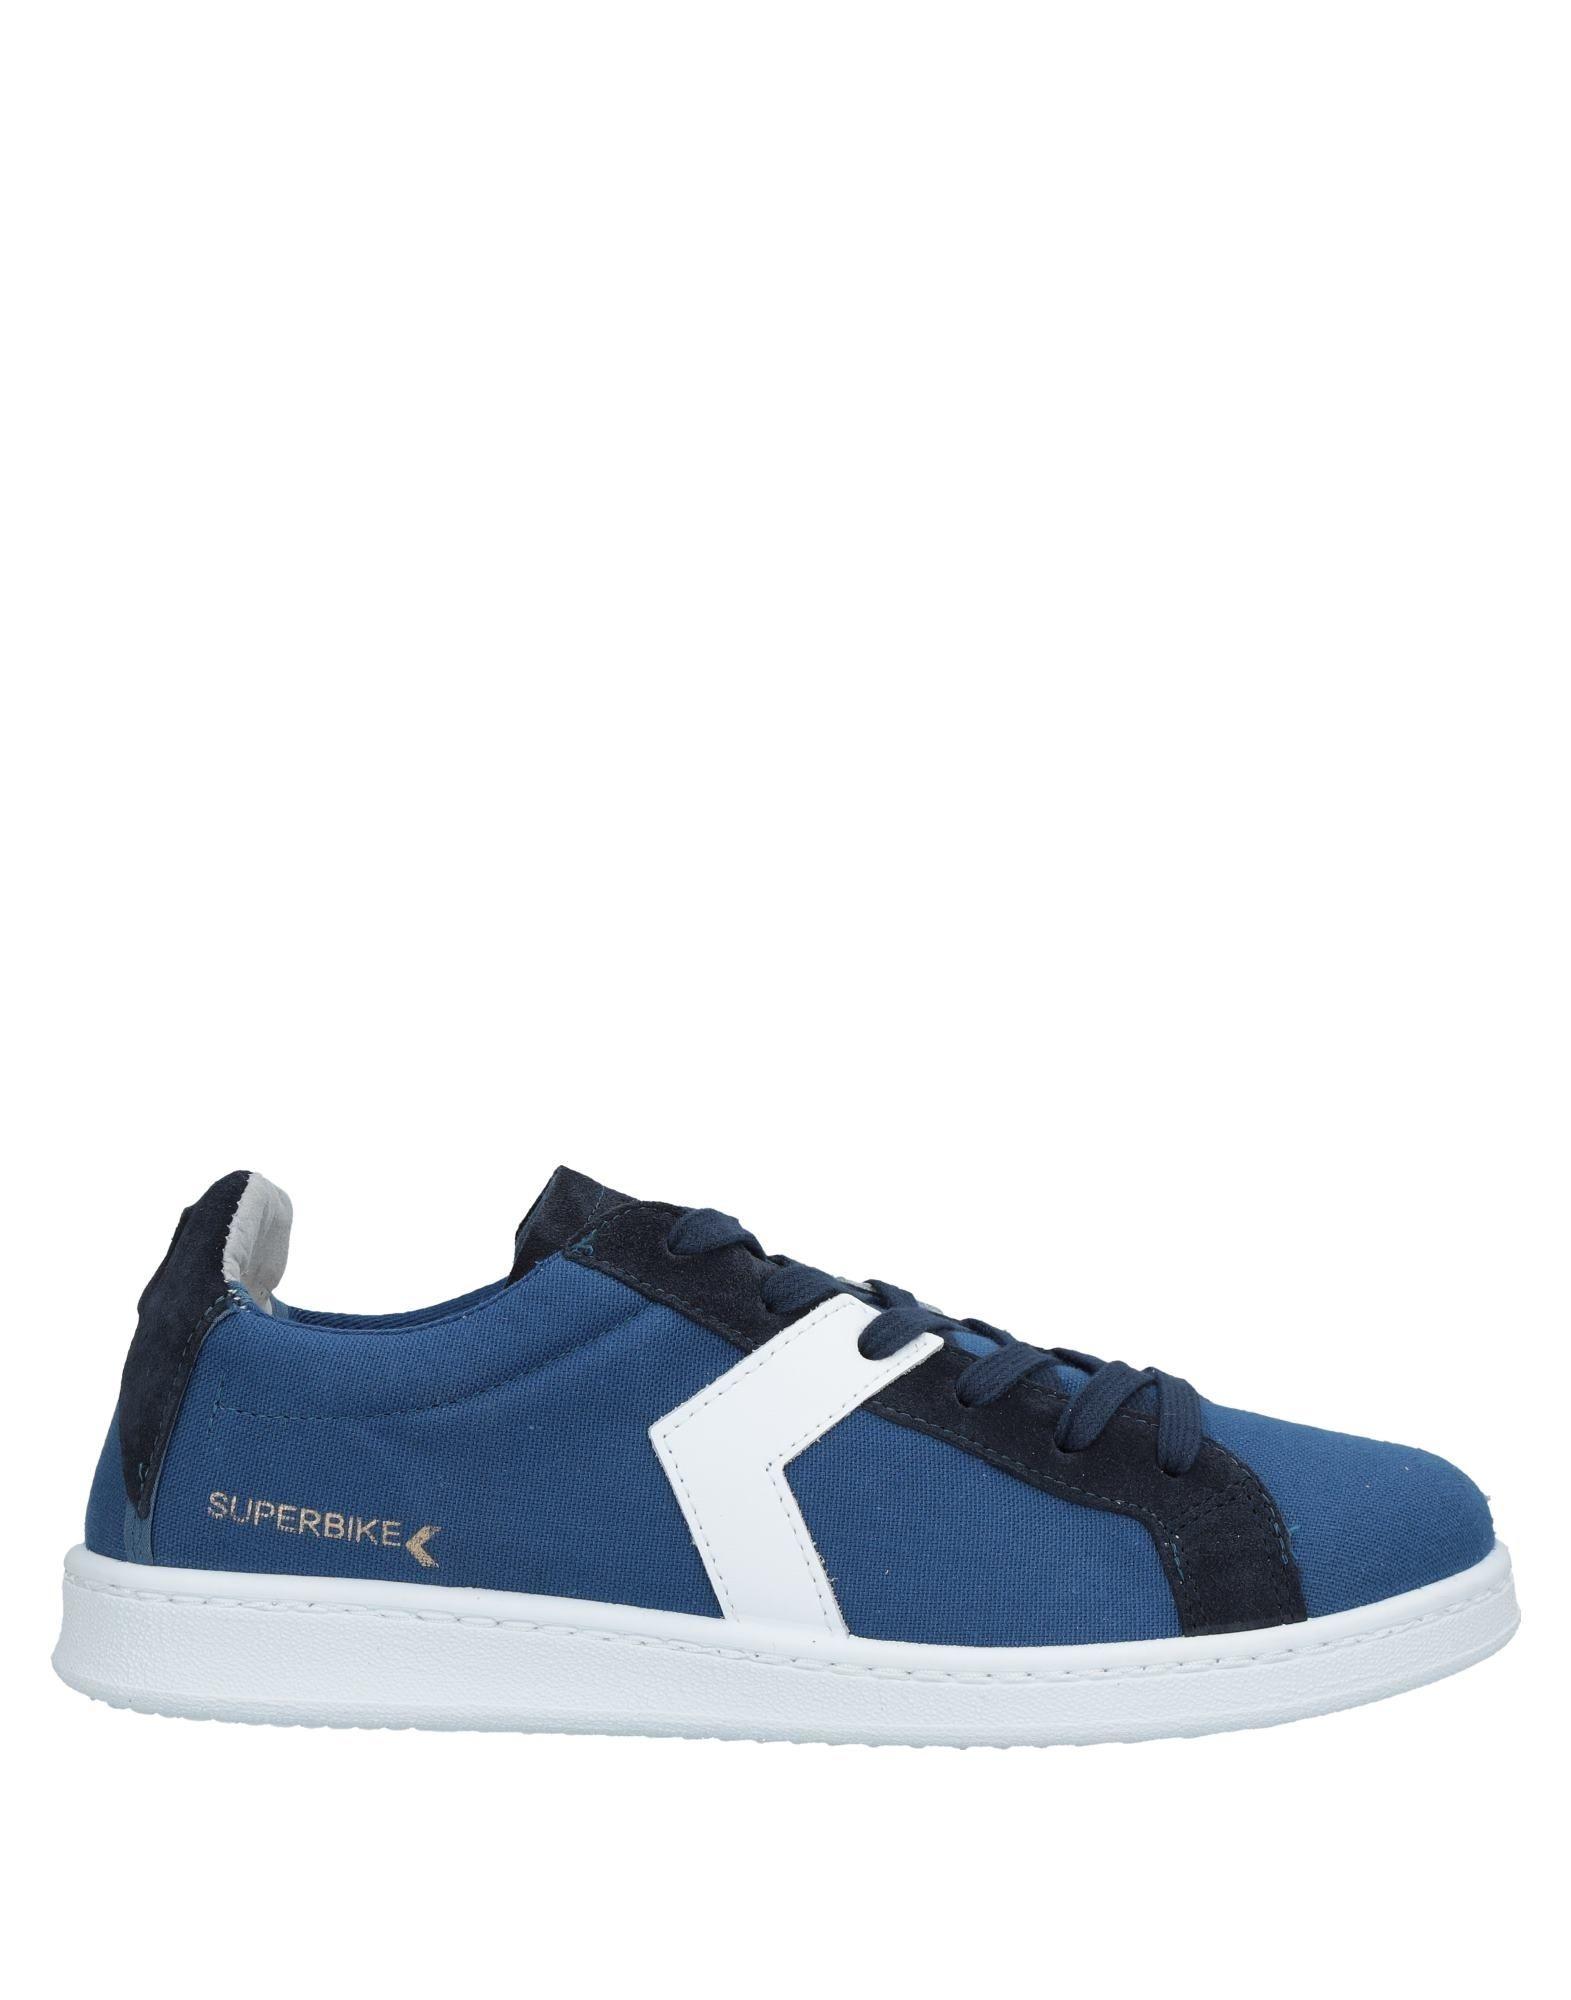 Superbike Sneakers 11514799JV Herren  11514799JV Sneakers Heiße Schuhe 884d0f